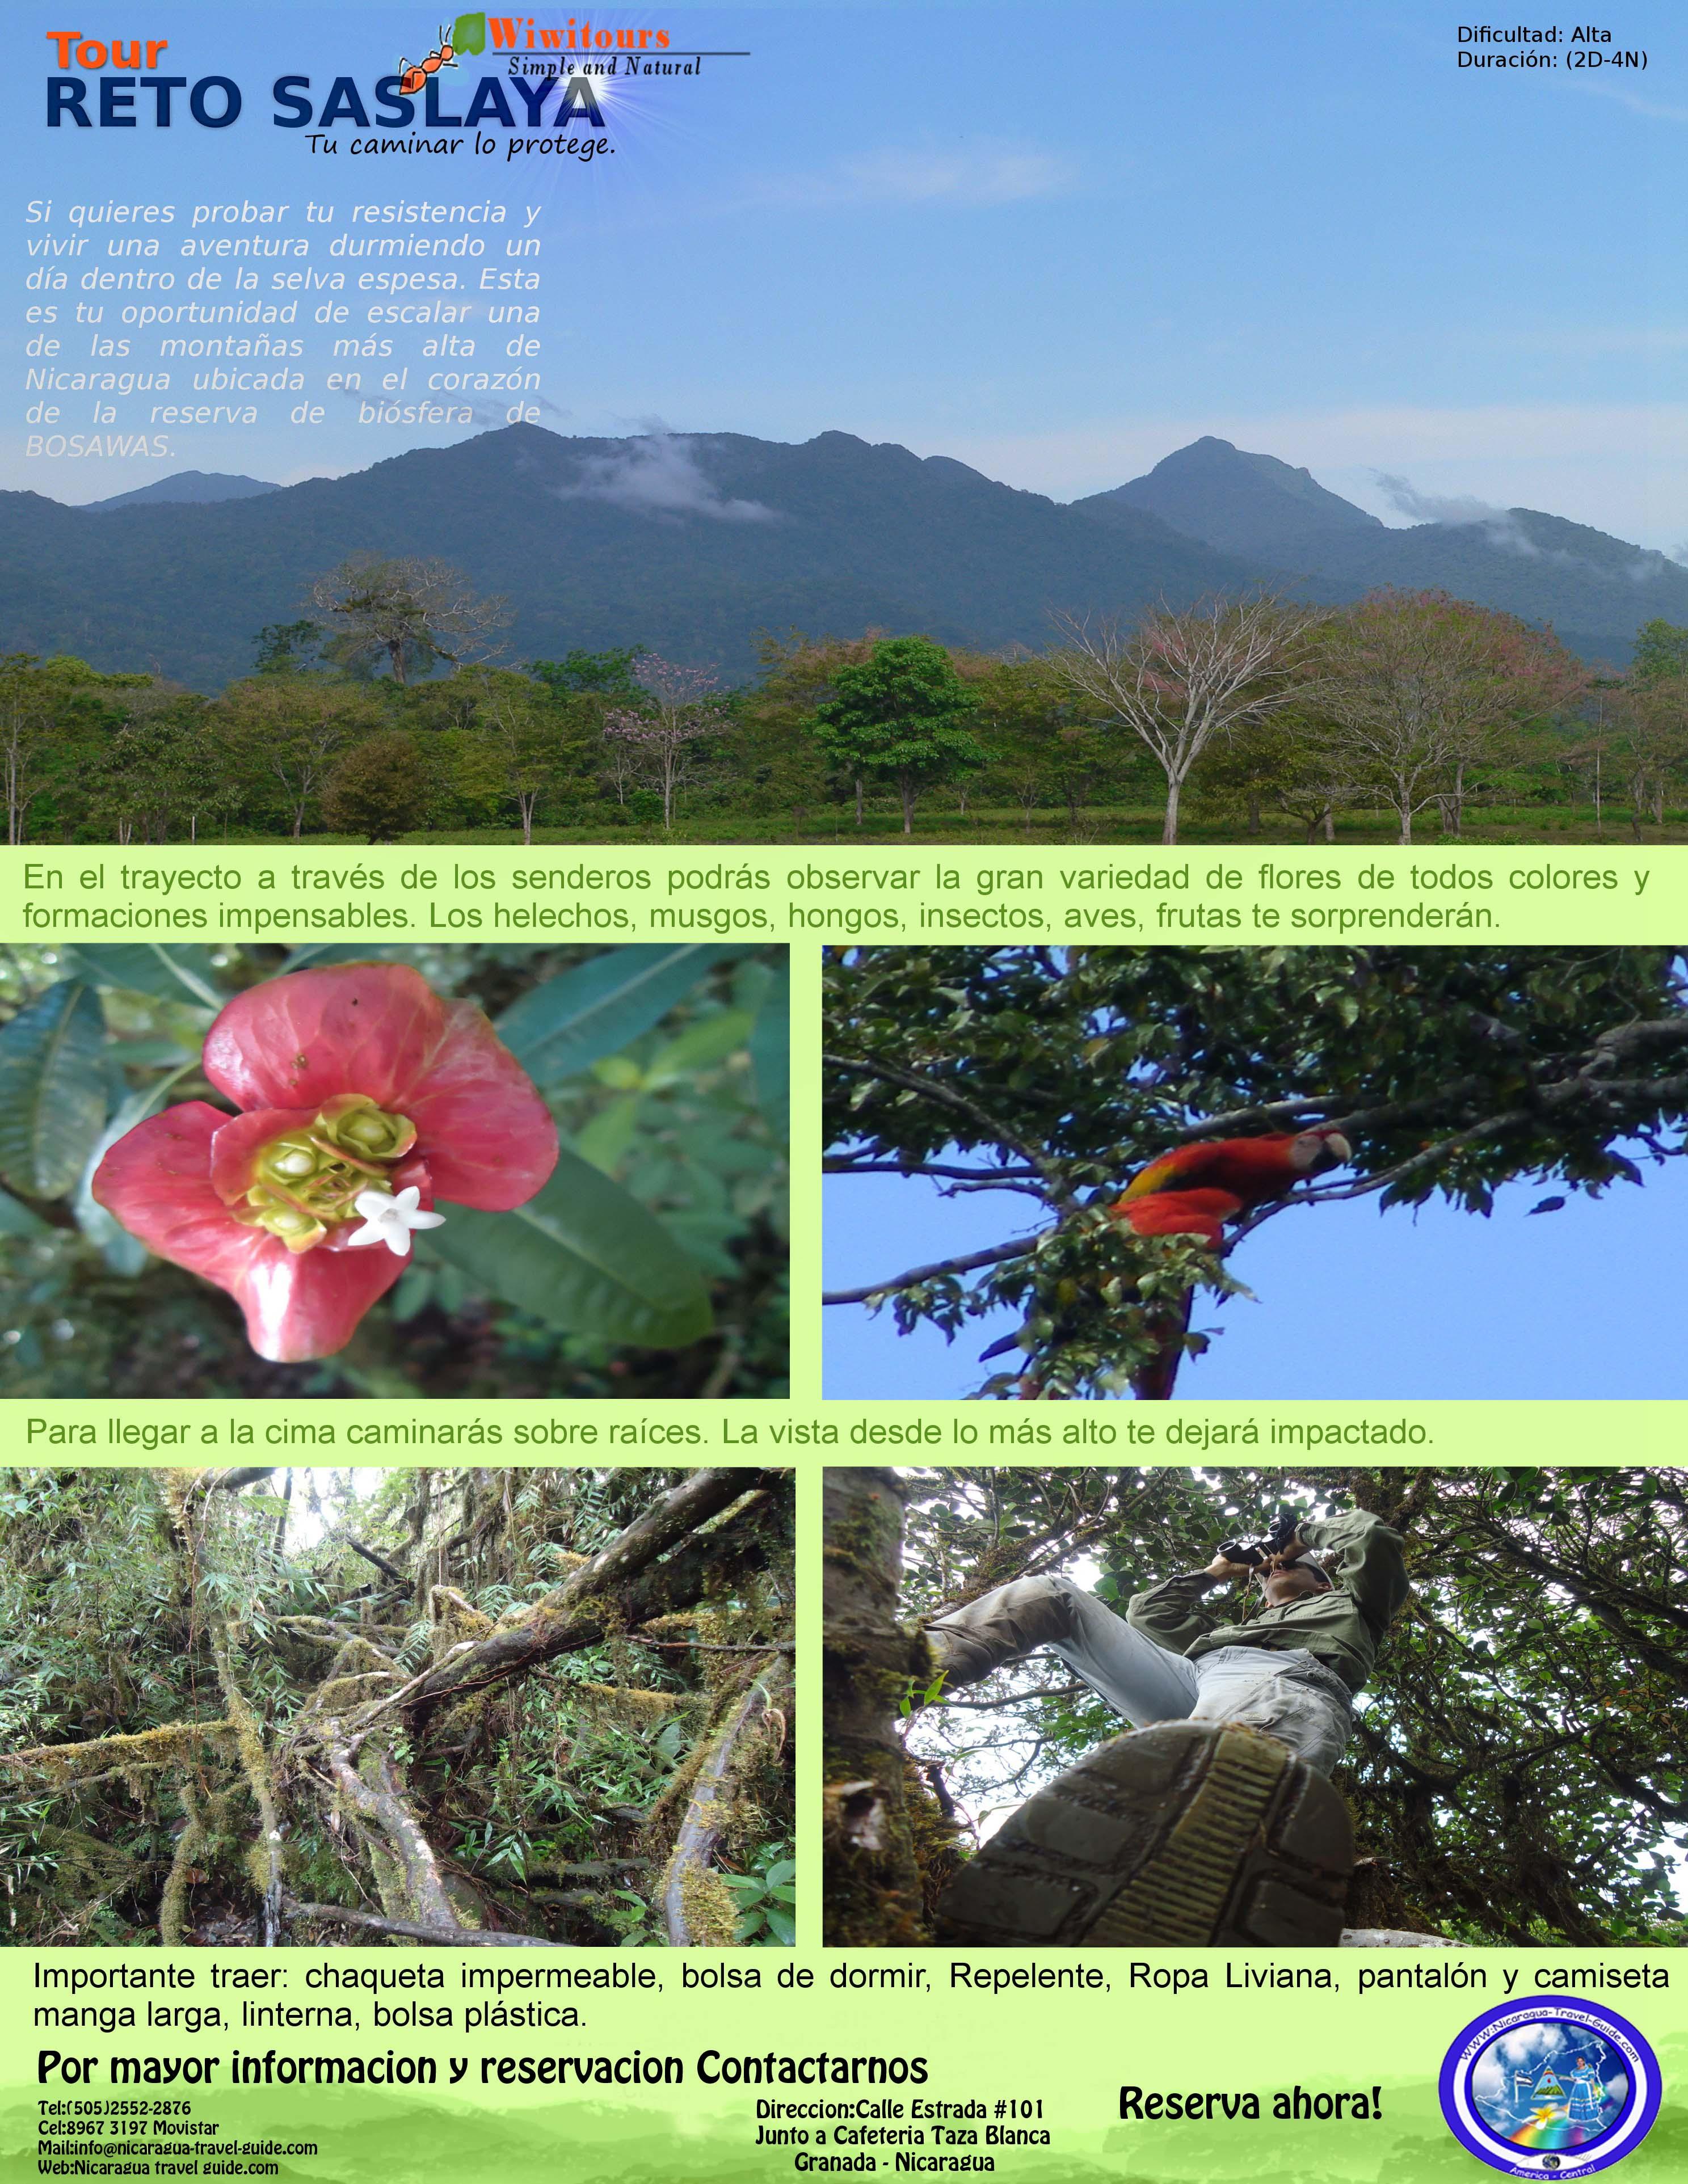 nicaragua travel guide region atlantico norte de nicaragua tour saslaya siuna zona minera